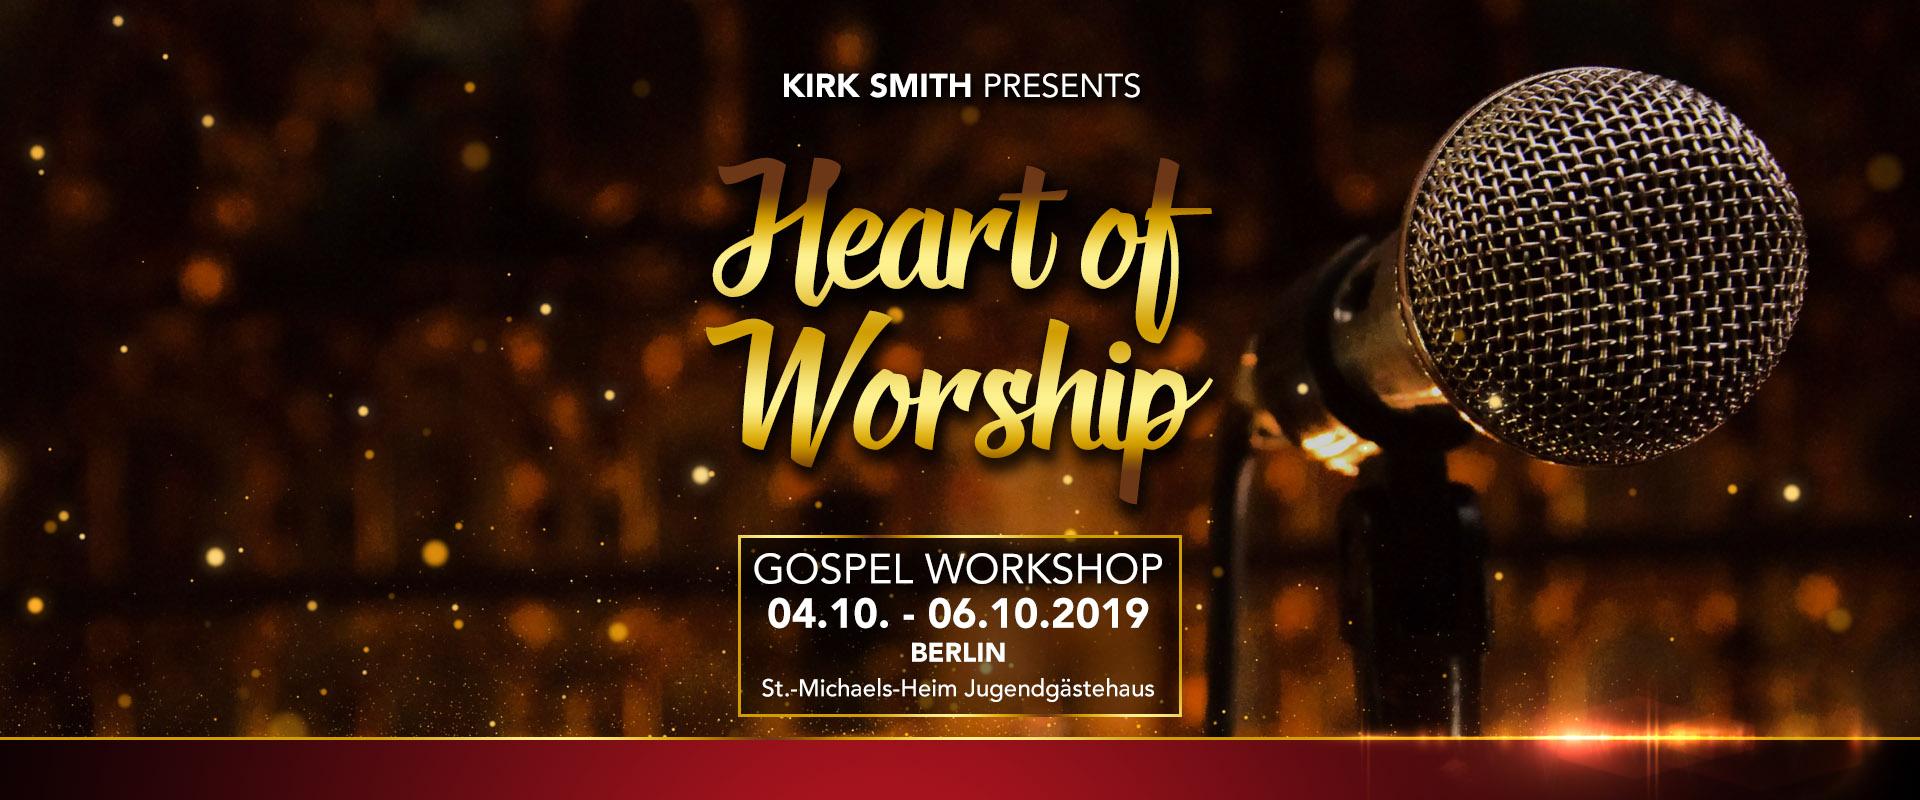 heart-of-worship-gospel-workshop-concert-slider-1920x800-okt2019-1-neu-bg